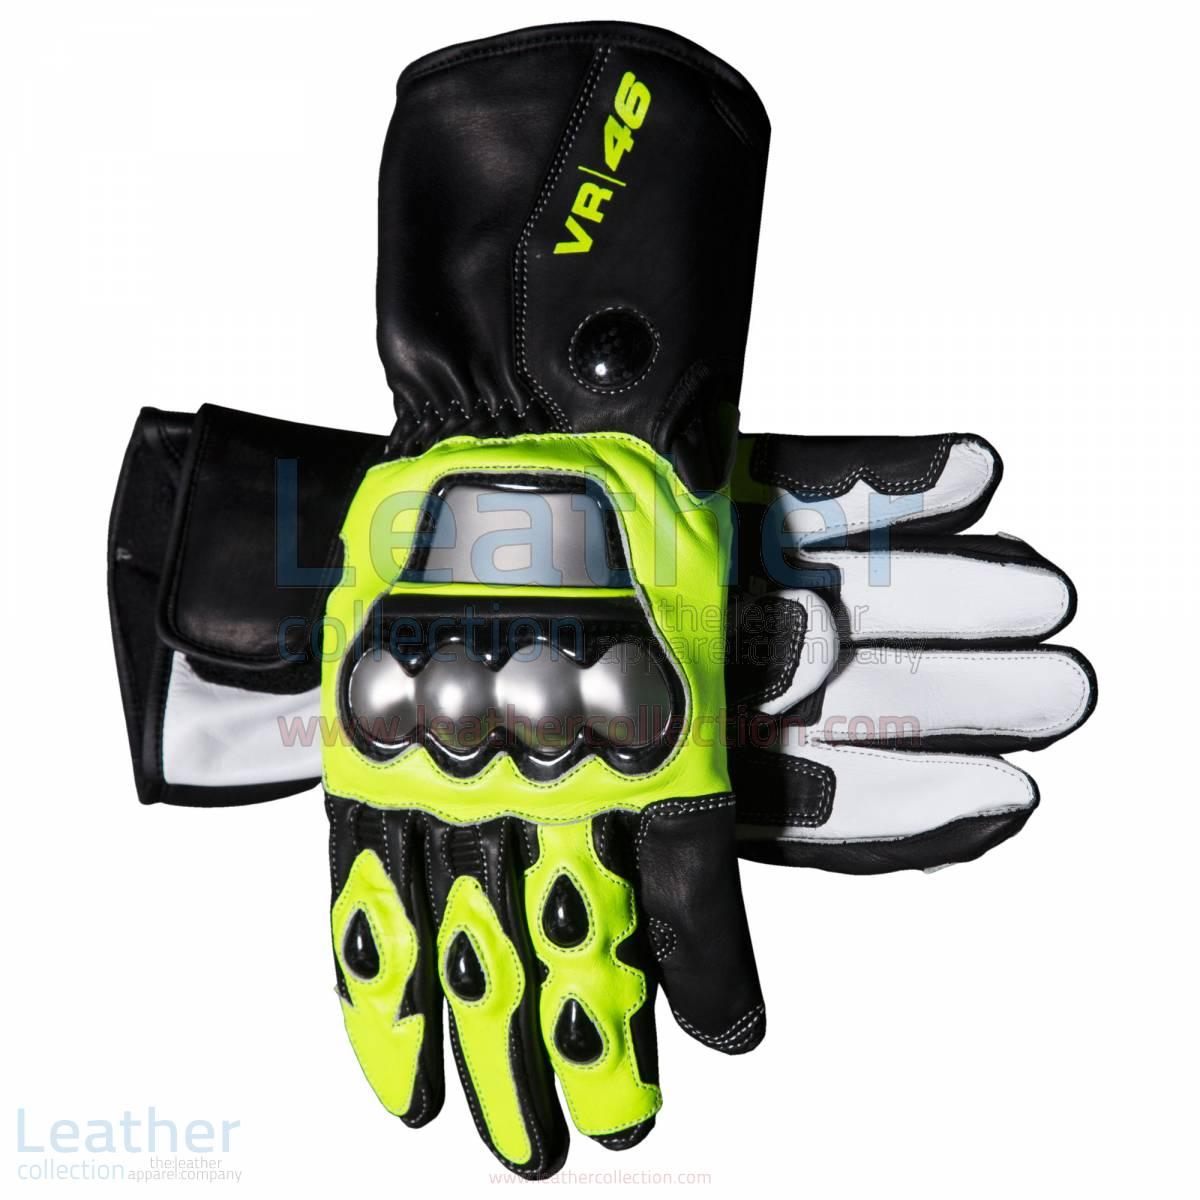 valentino rossi vr46 racing gloves